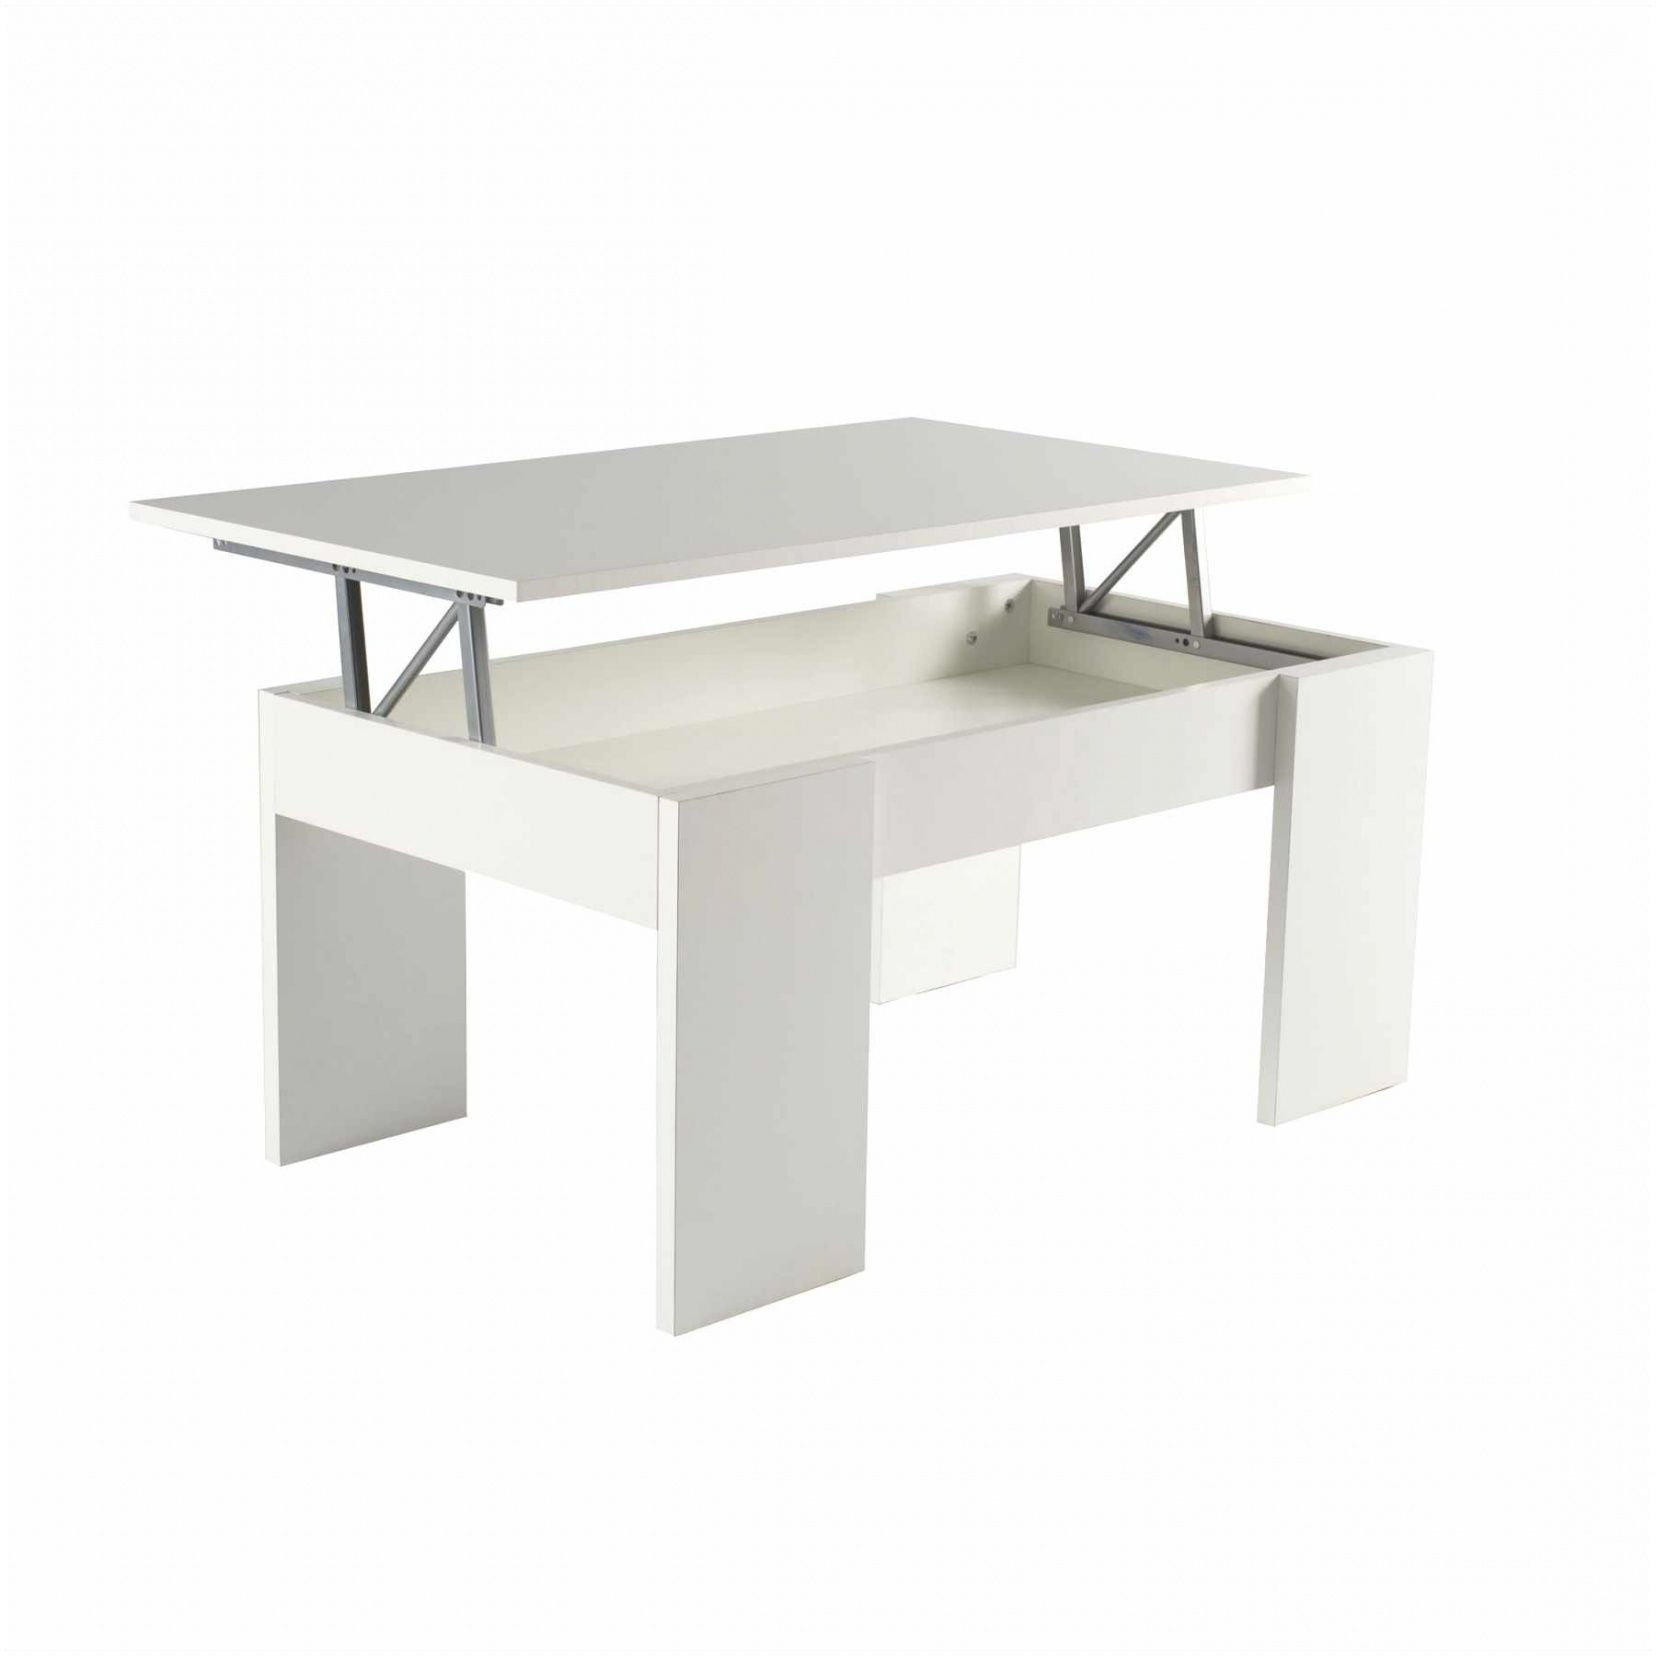 Mesas Plegables Cocina Ikea Q5df norden Mesa Alas Abatibles Blanco ...